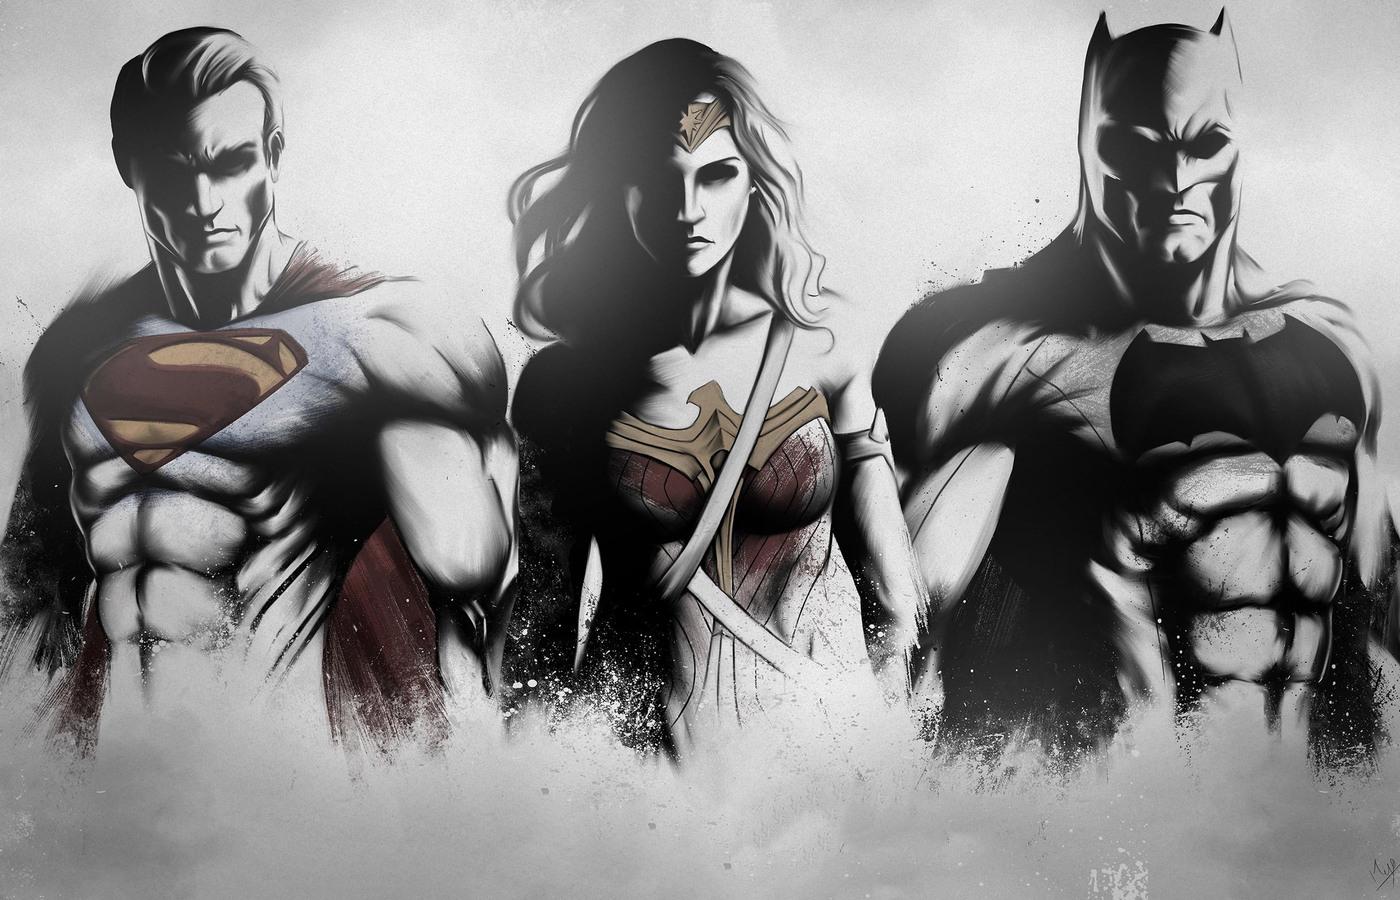 superman-wonder-woman-batman-art-sketch-4k-5t.jpg